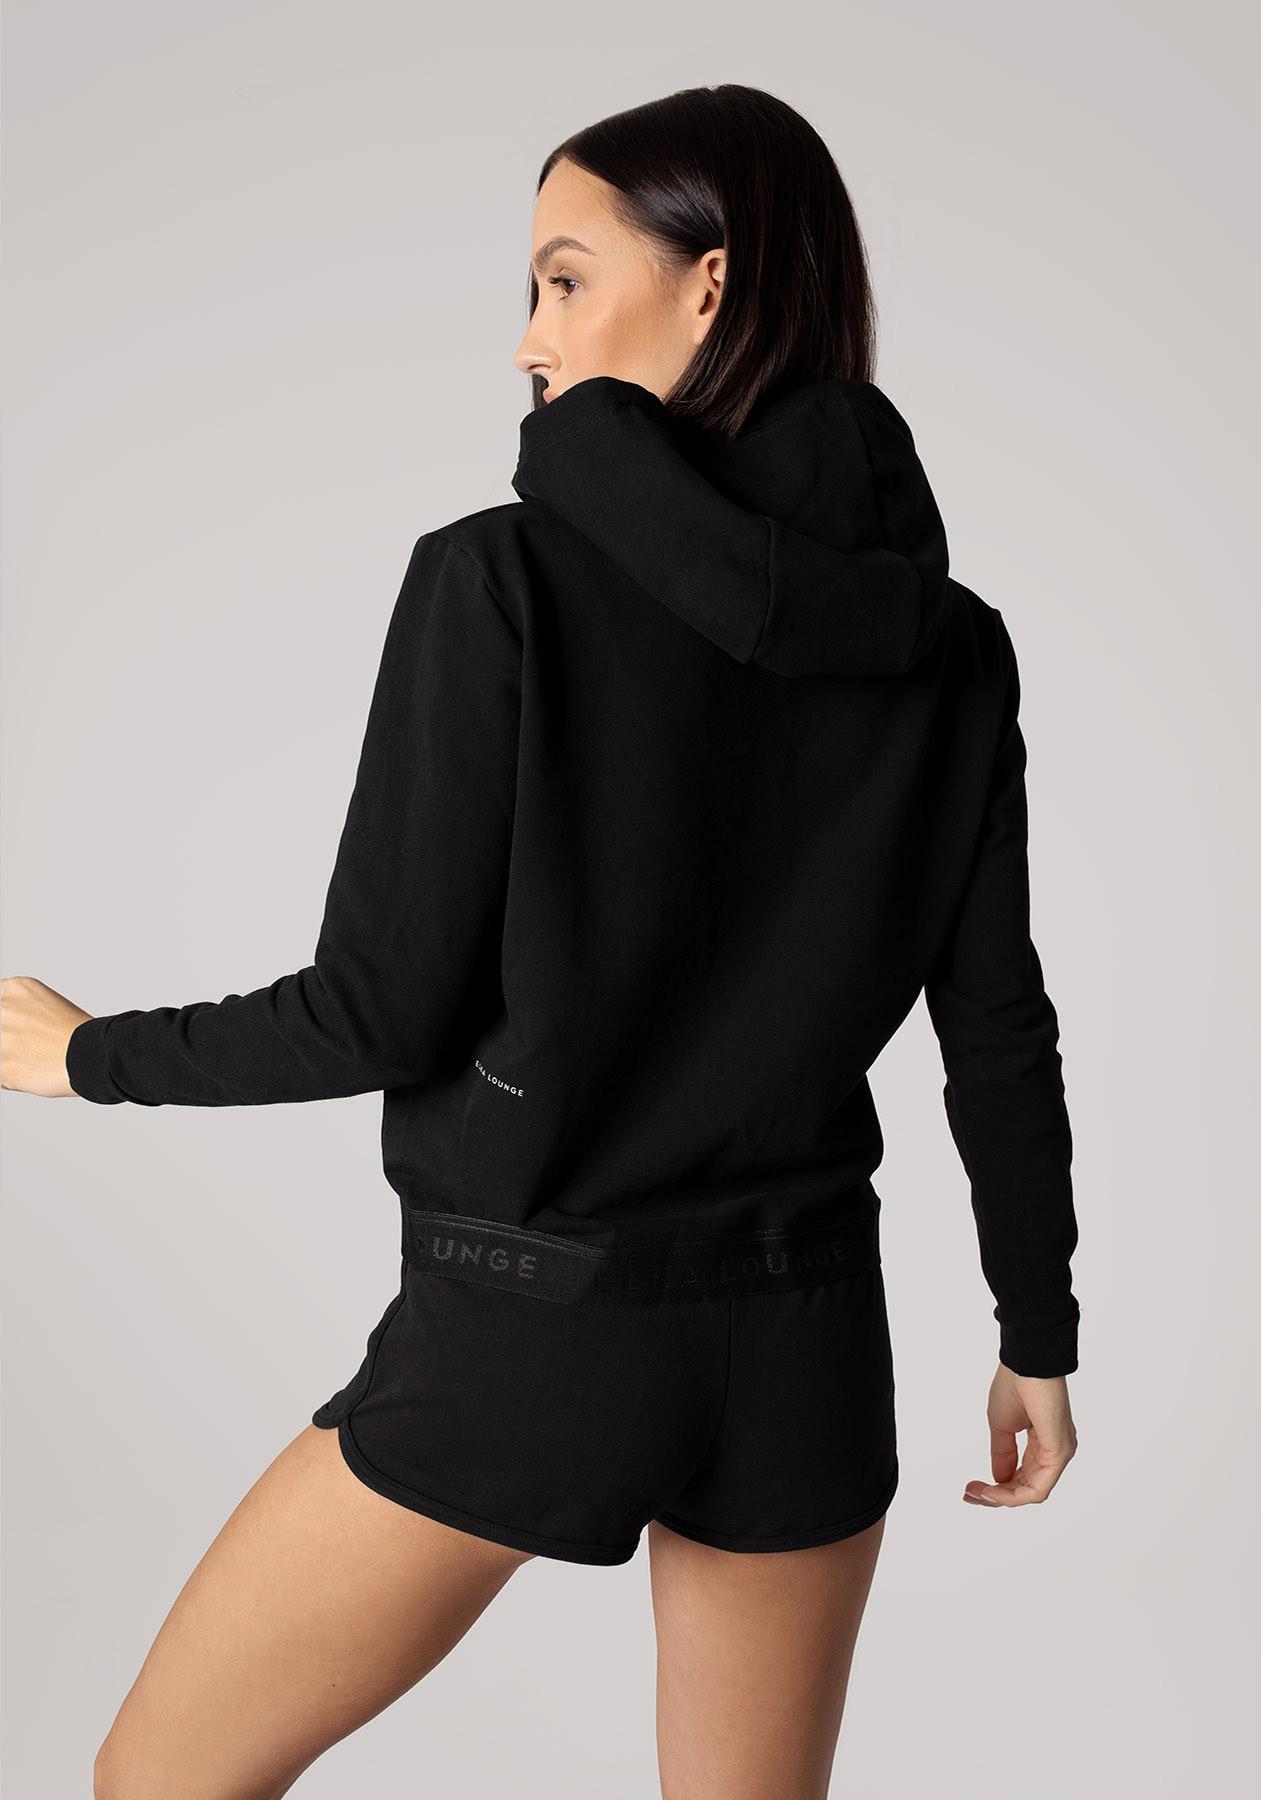 Women-shorts,sweatwhirt-ELKA-Lounge-W00551,556